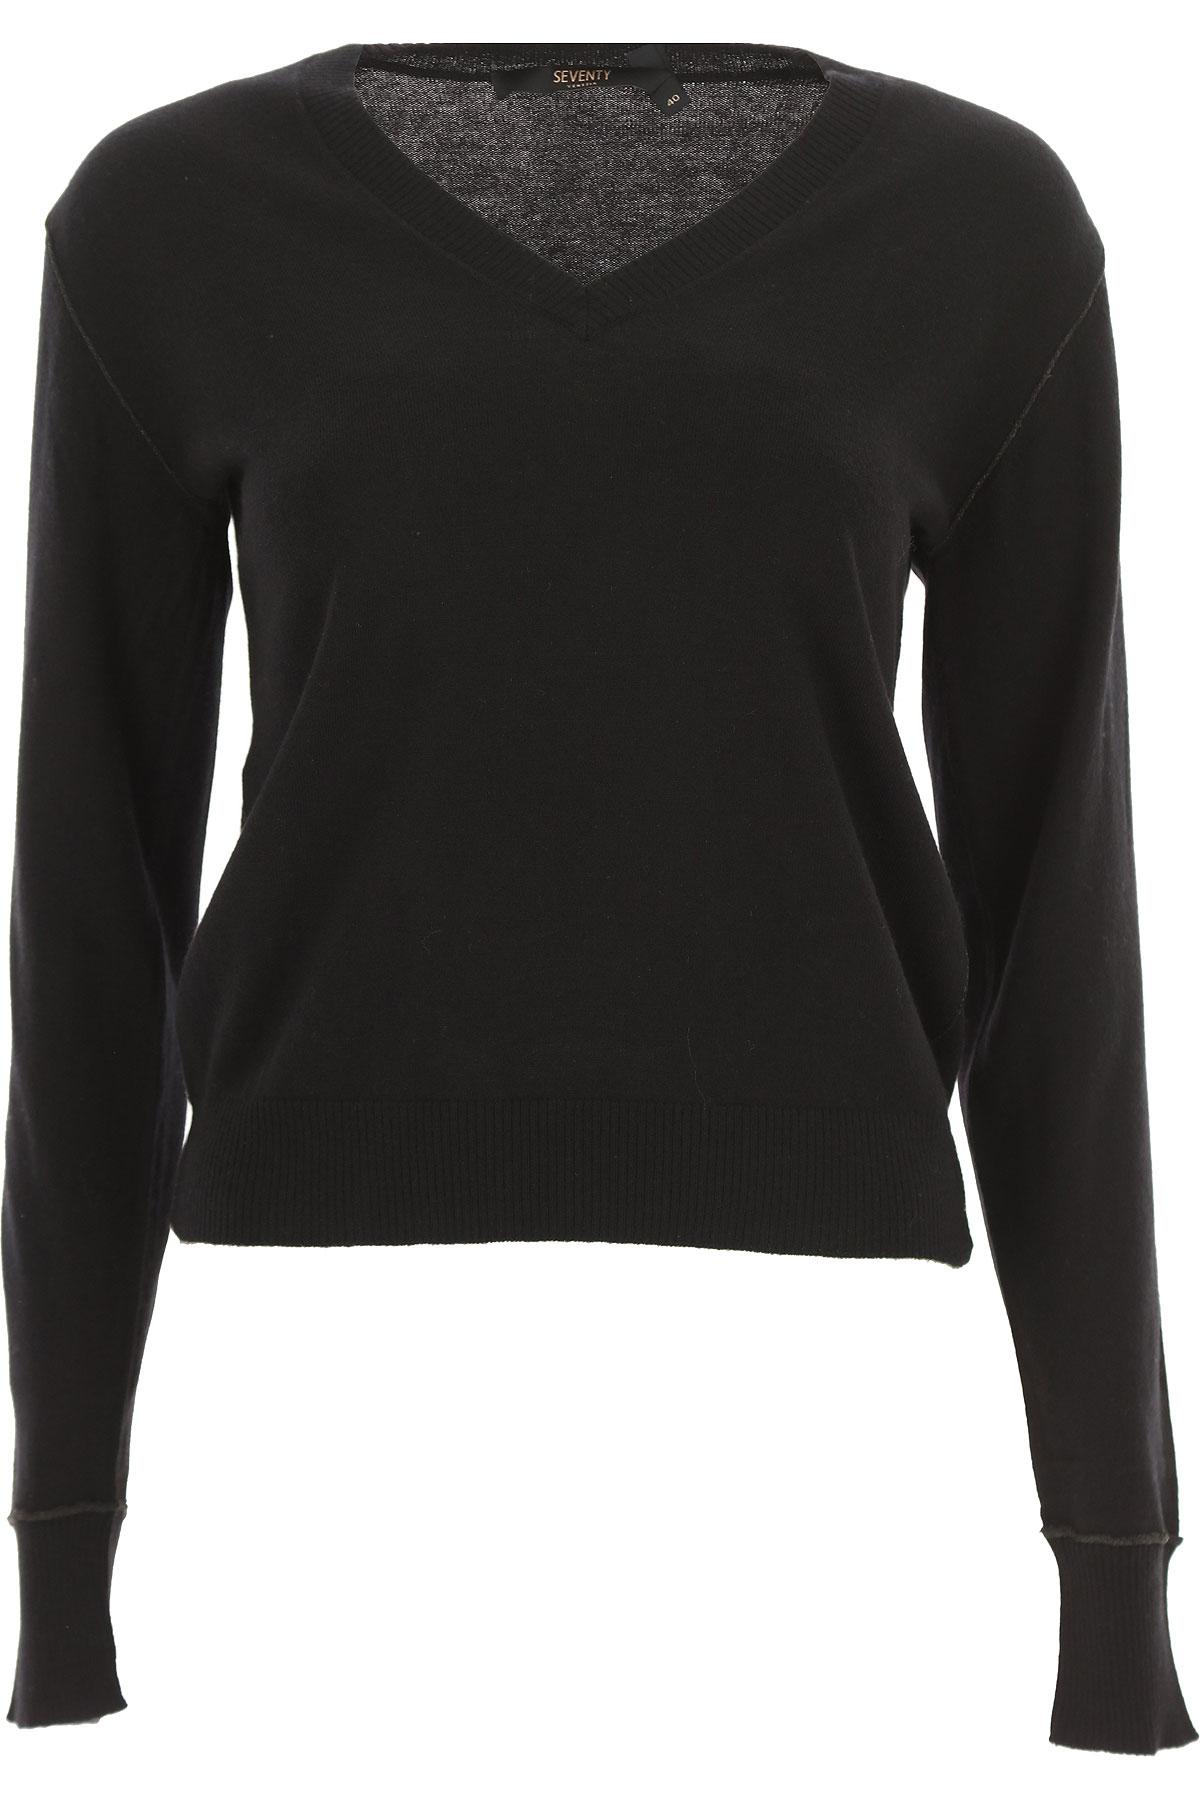 Seventy Sweater for Women Jumper On Sale, Black, polyamide, 2019, 4 6